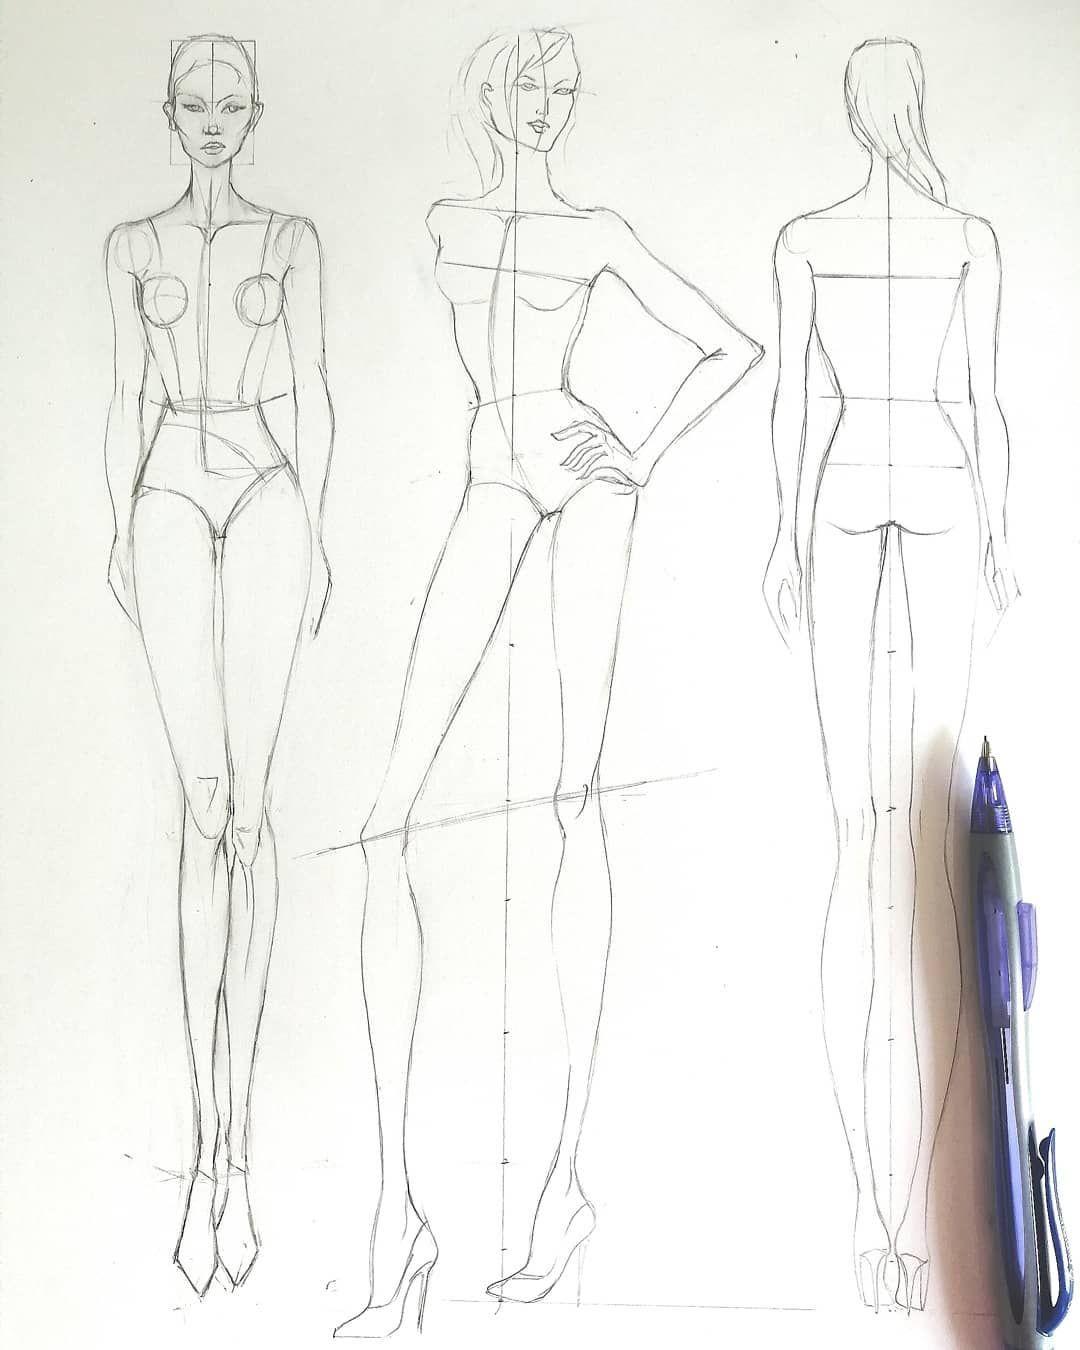 Practising Fashion Croquis Today Fashionsketching Fashionillust Fashion Illustration Poses Fashion Figure Drawing Fashion Illustrations Techniques